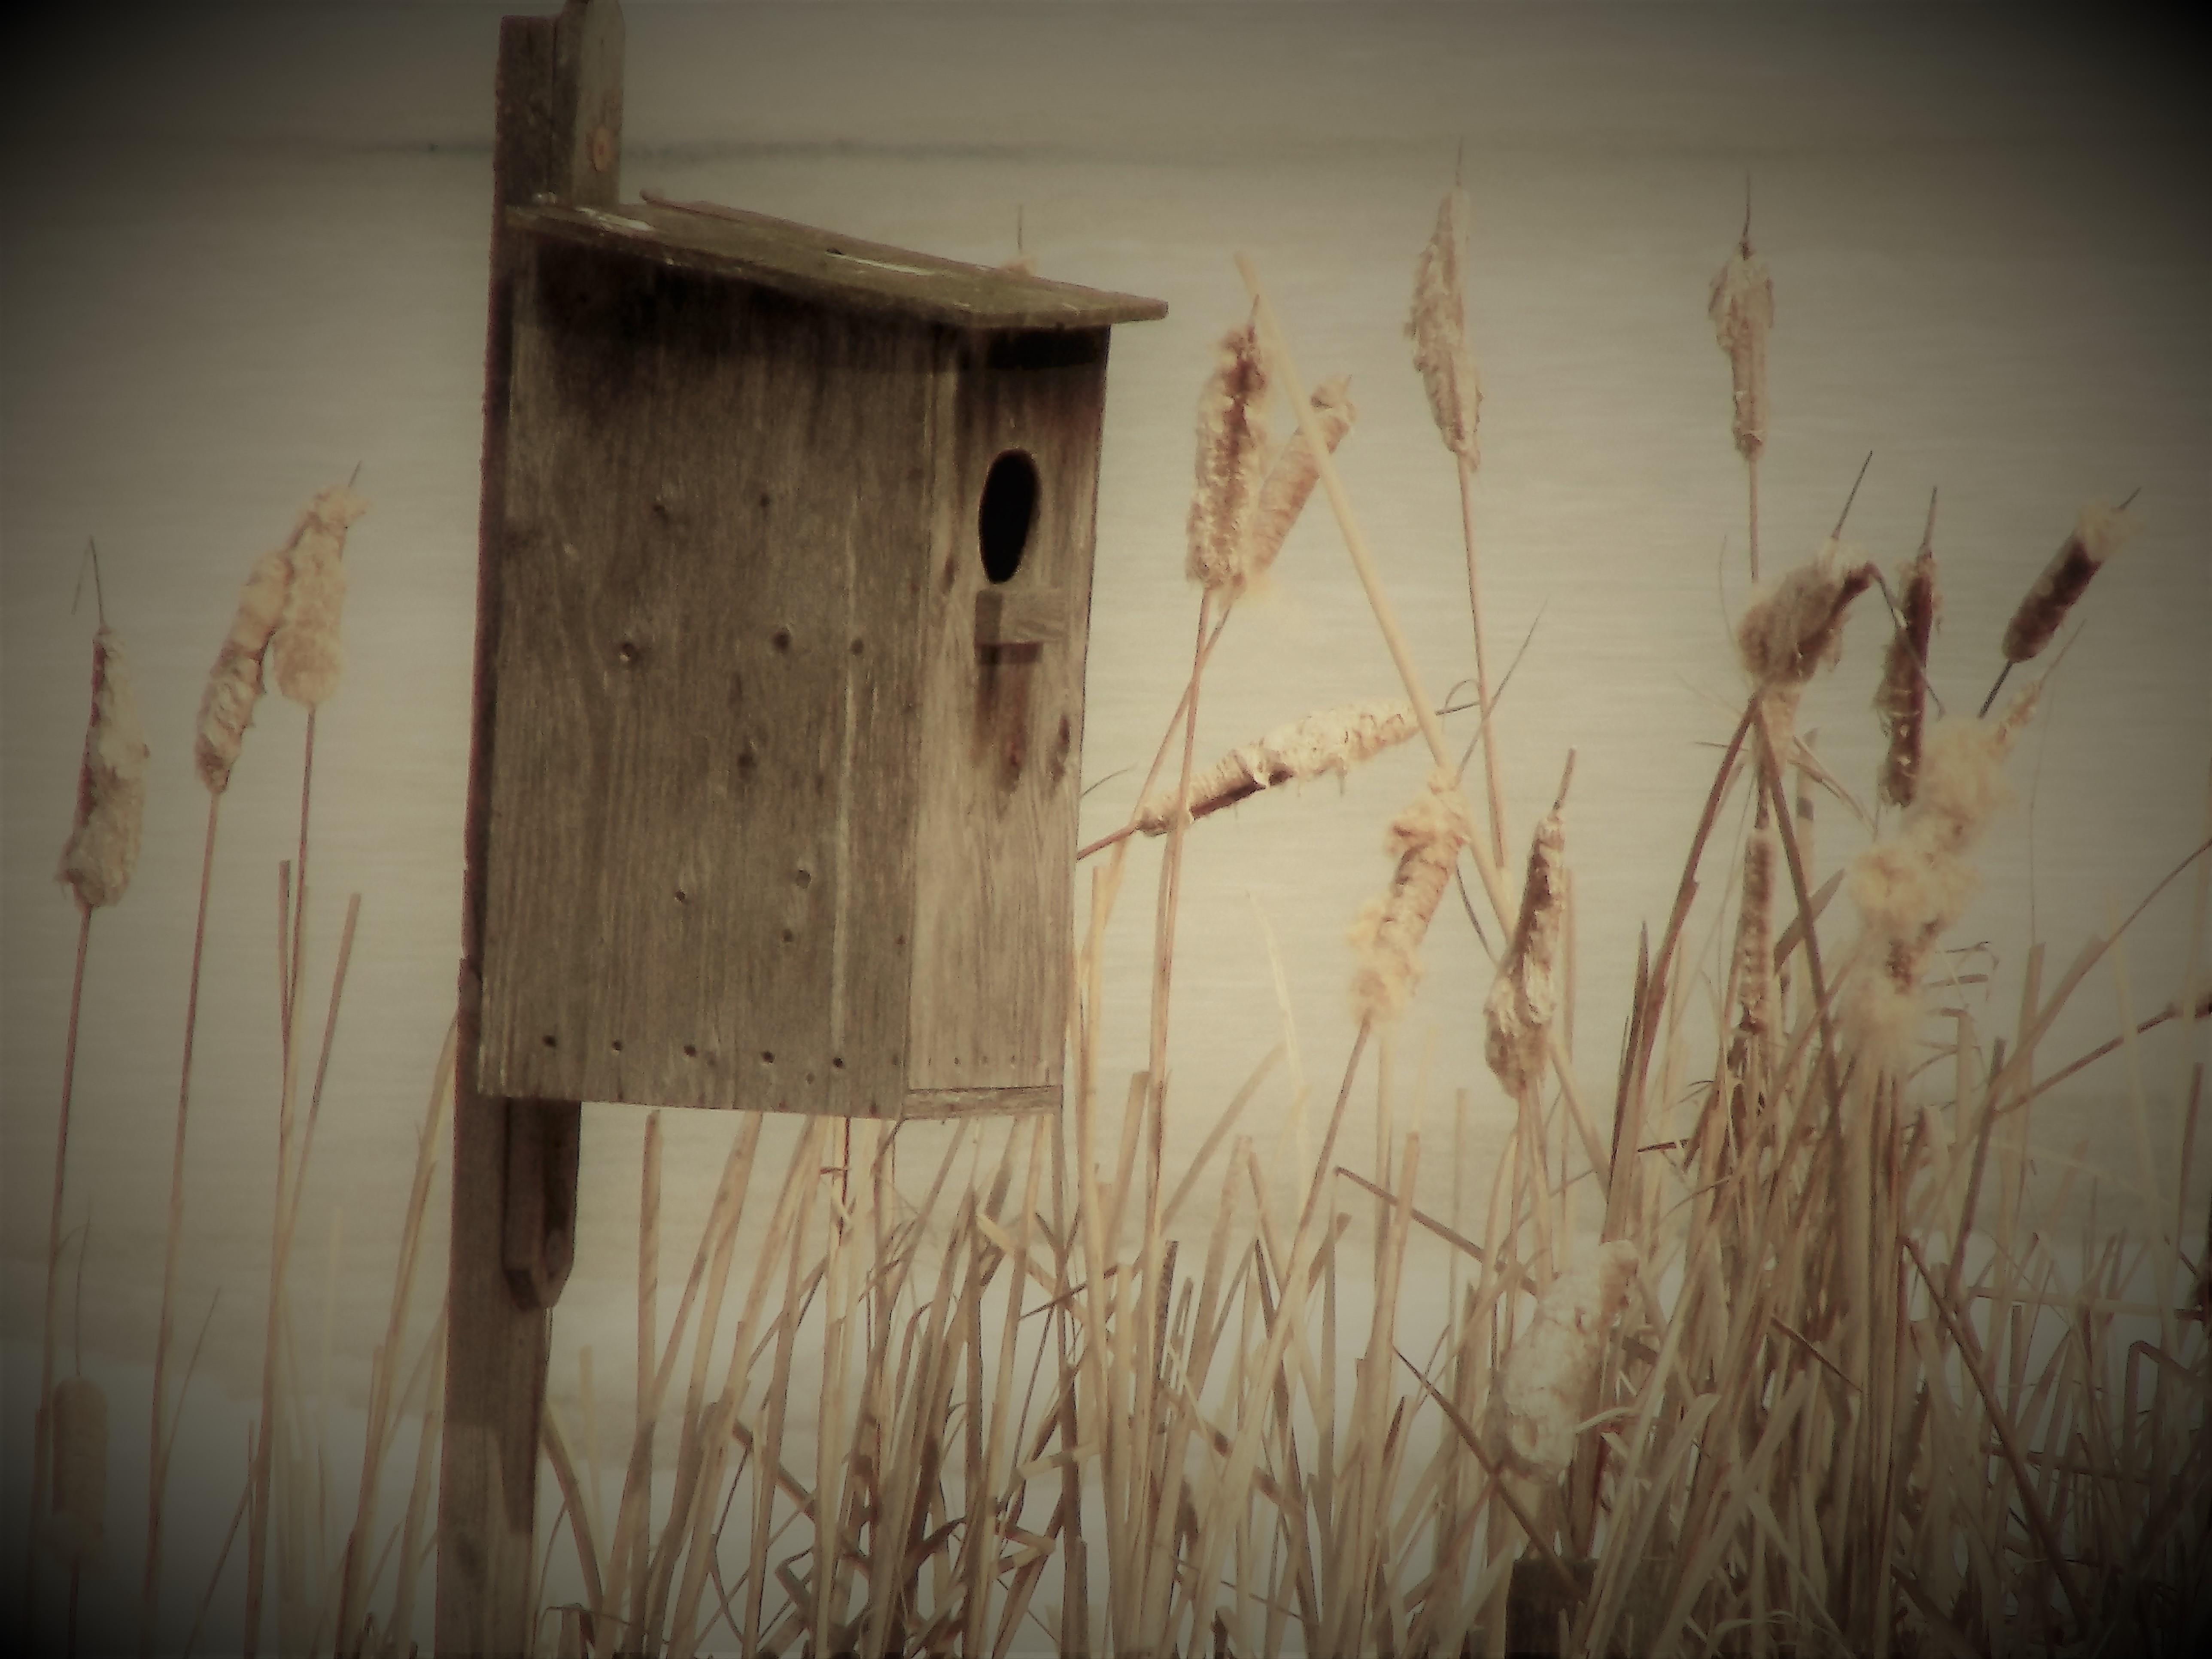 birdhouse Burlesque